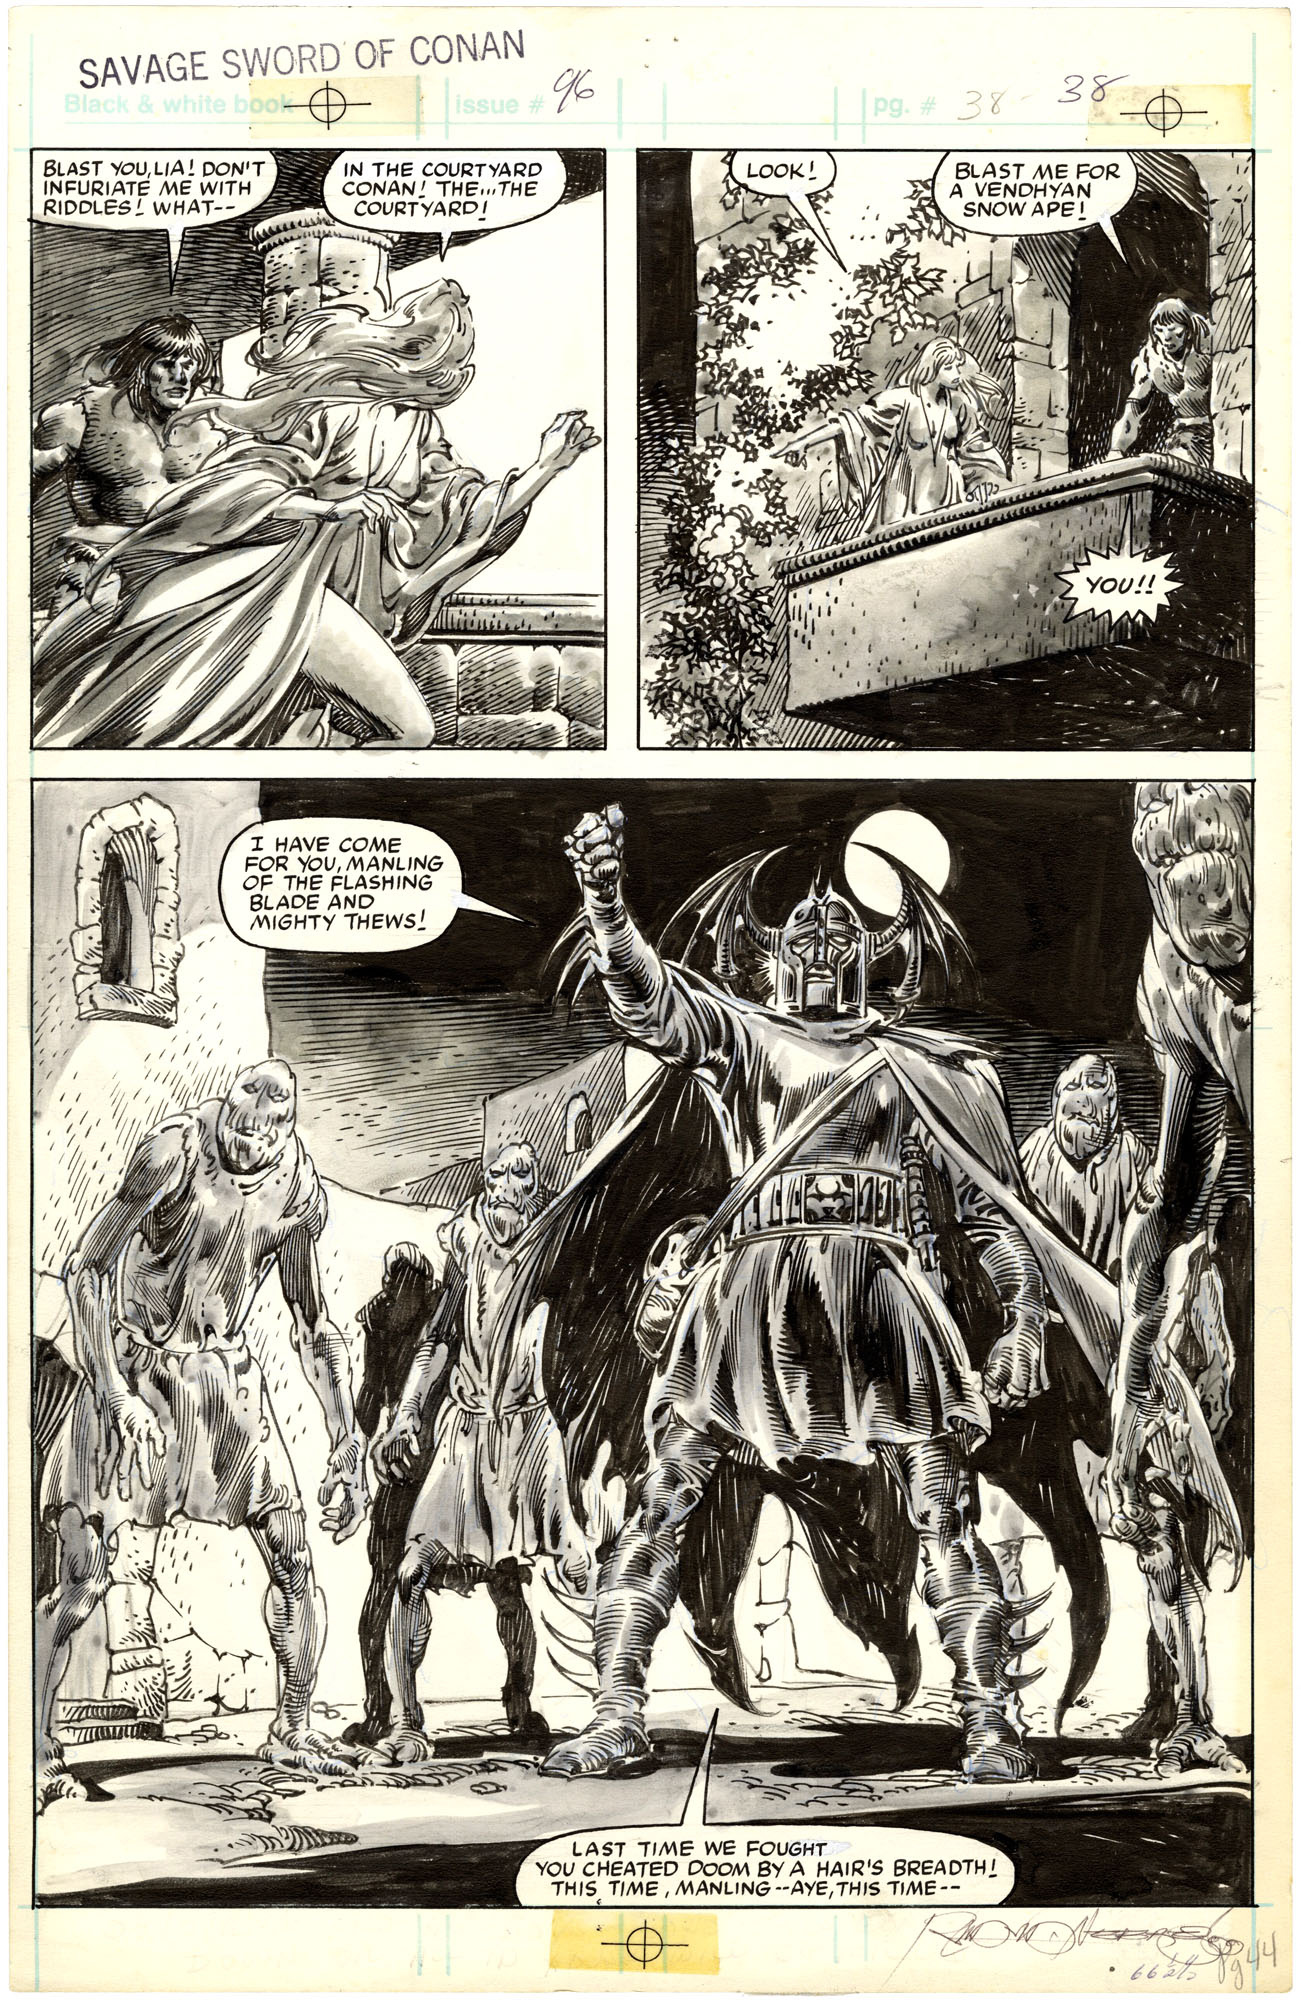 Savage Sword of Conan #96 p38